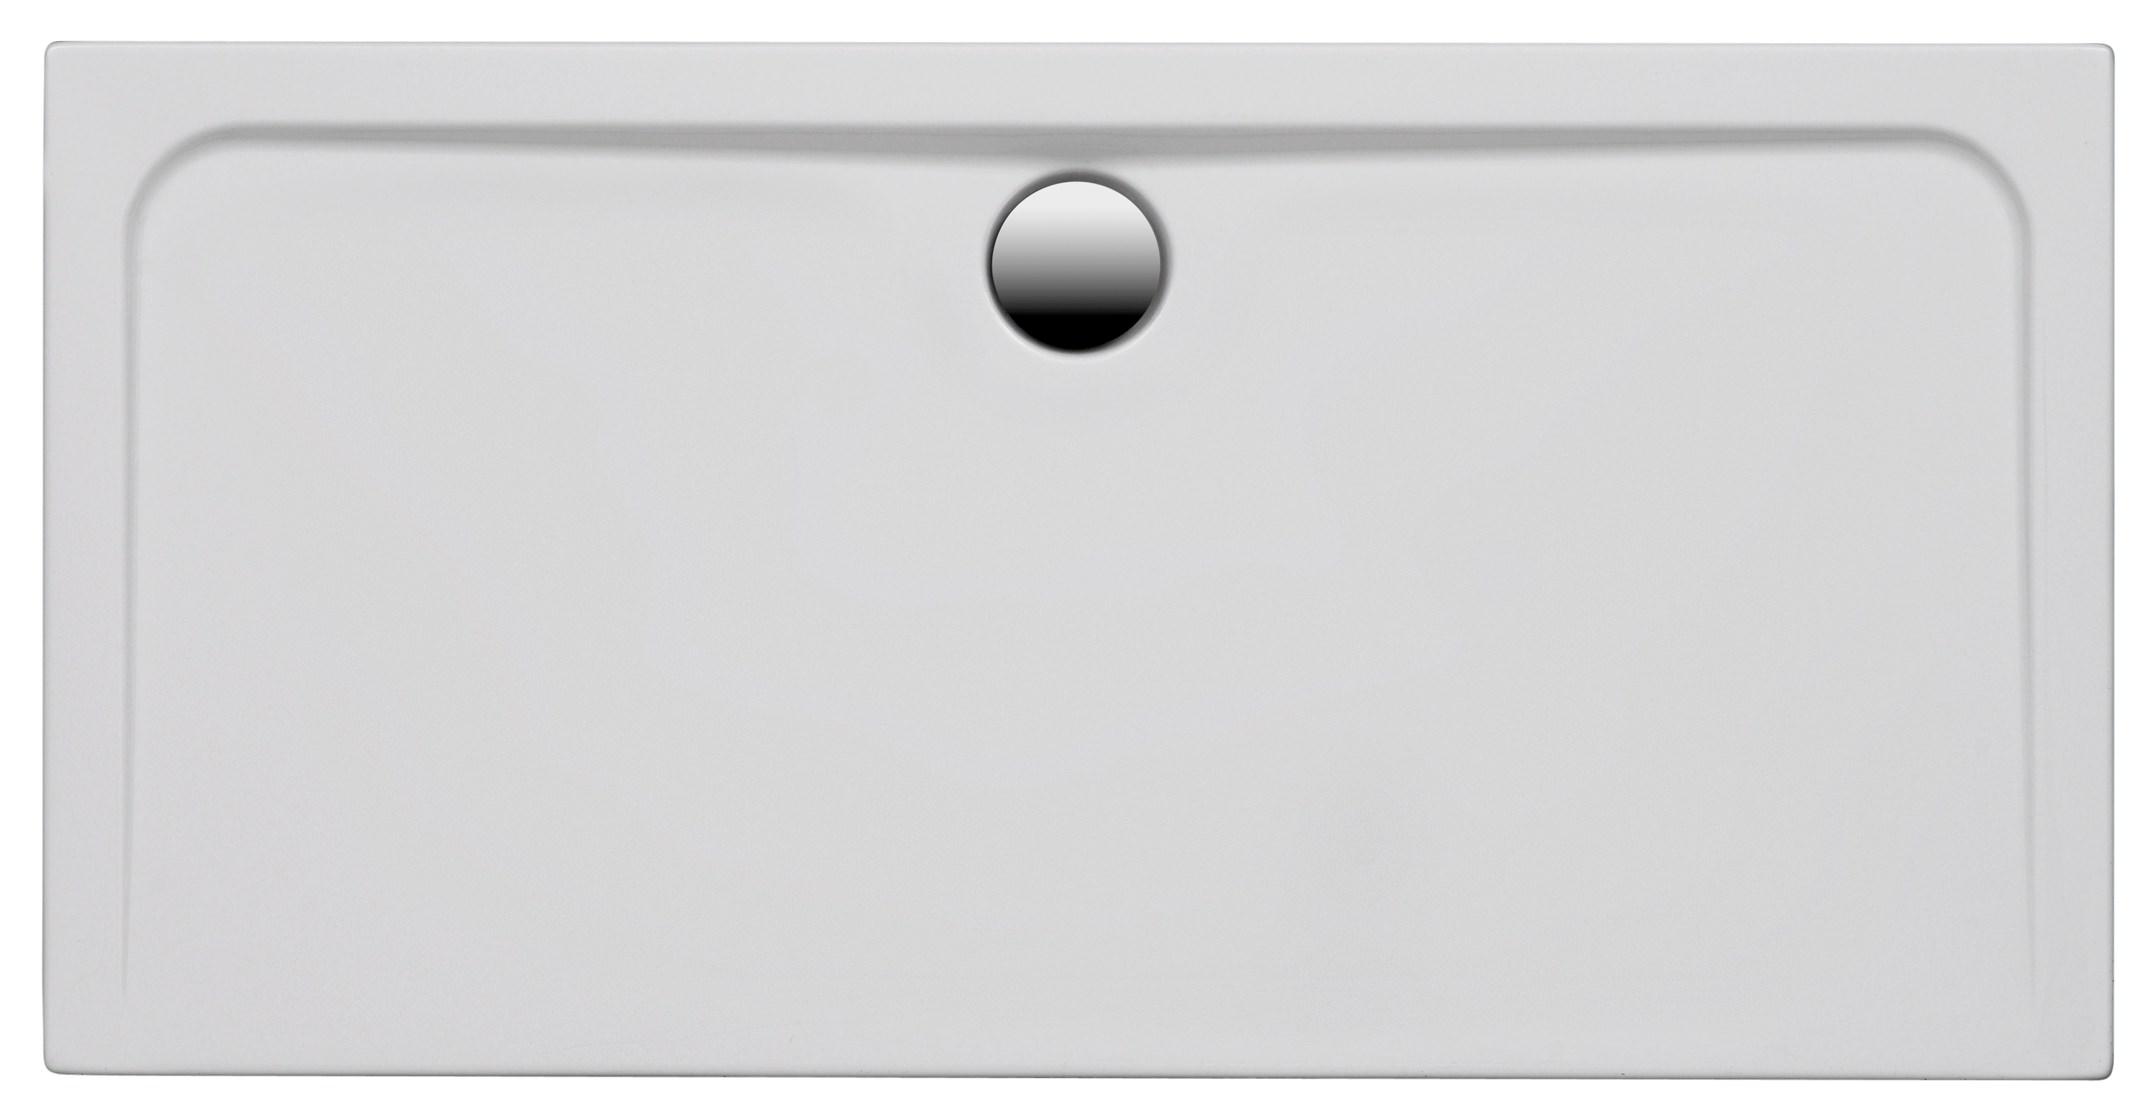 ottofond latest ottofond loredana x cm with ottofond ottofond einbauwanne koala vario. Black Bedroom Furniture Sets. Home Design Ideas